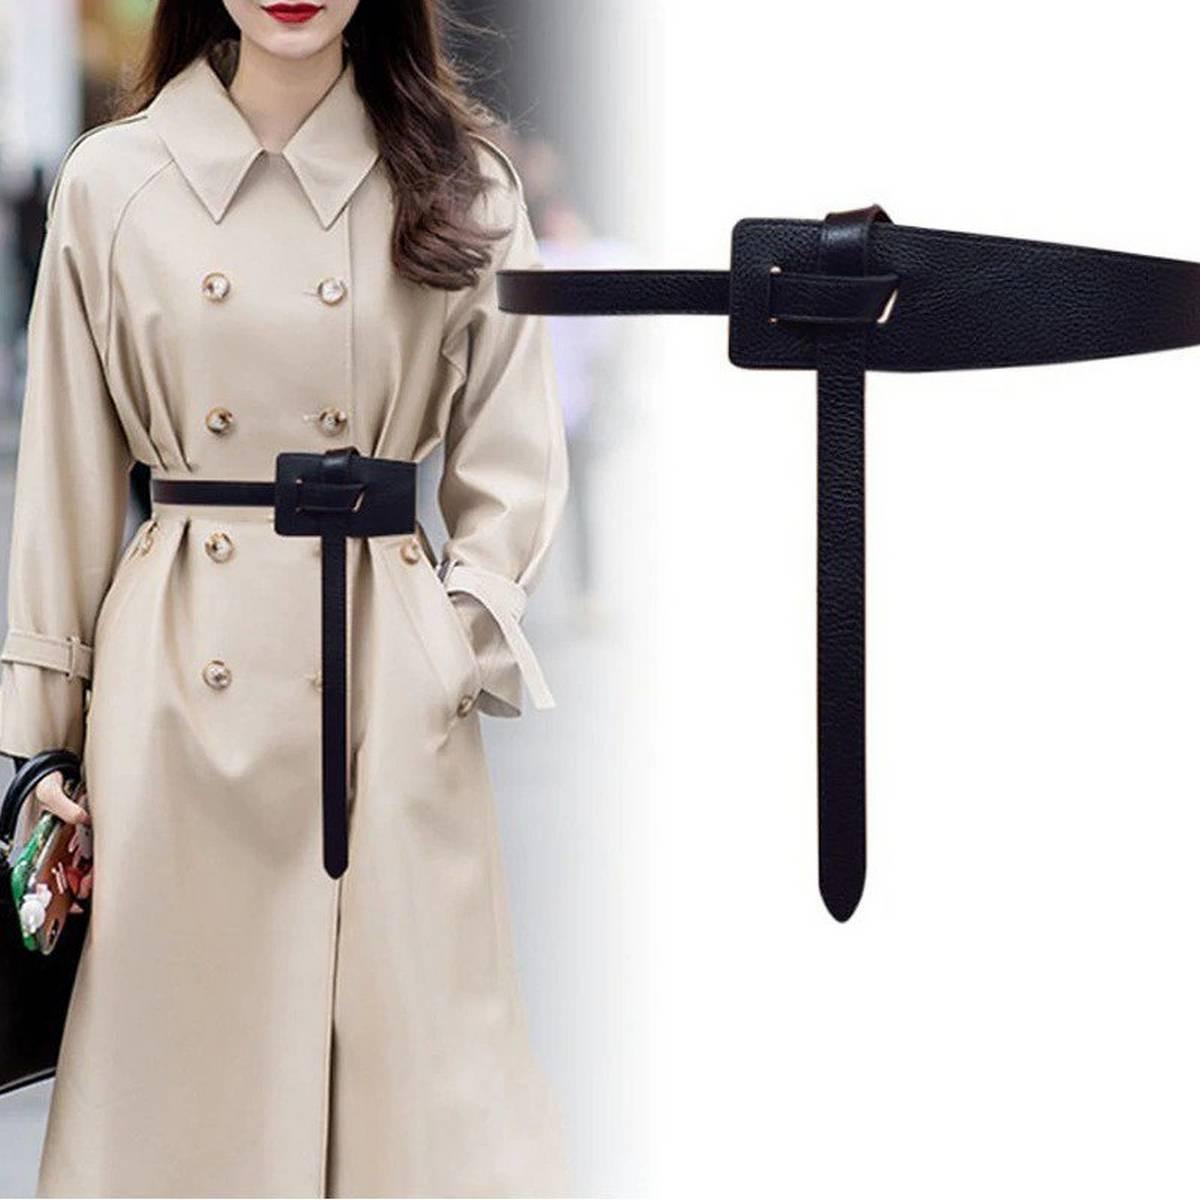 2020 New Wide Leather Corset Belt Female Tie Obi Thin Black Bow Leisure Belts for Lady Wedding Dress Waistband Women's Belts